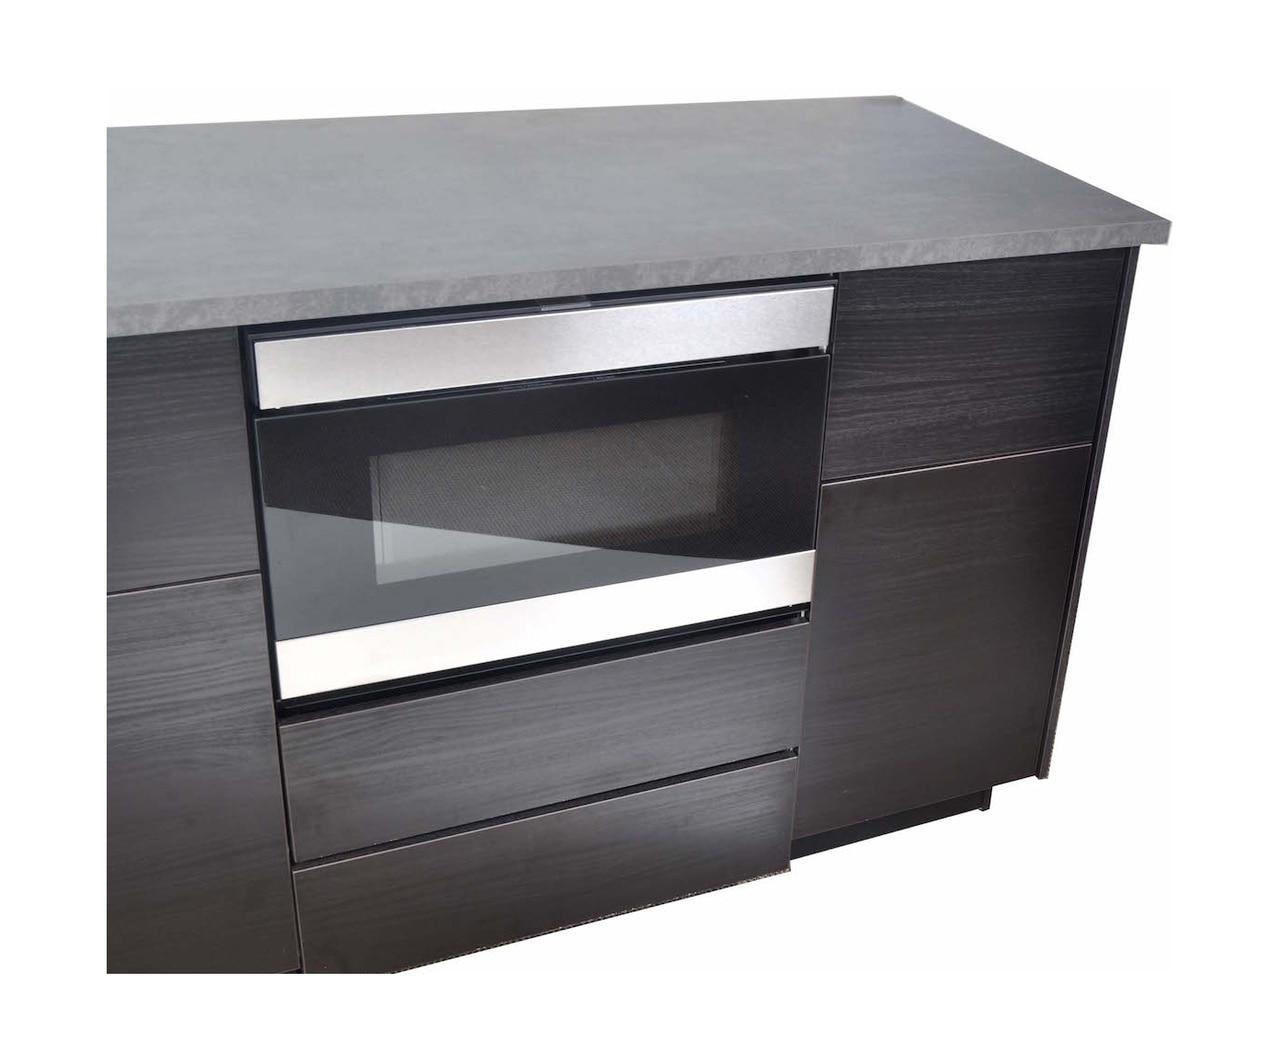 "24"" Microwave Drawer ™ Oven Pedestal (SKMD24U0ES) Installed Under the Counter"